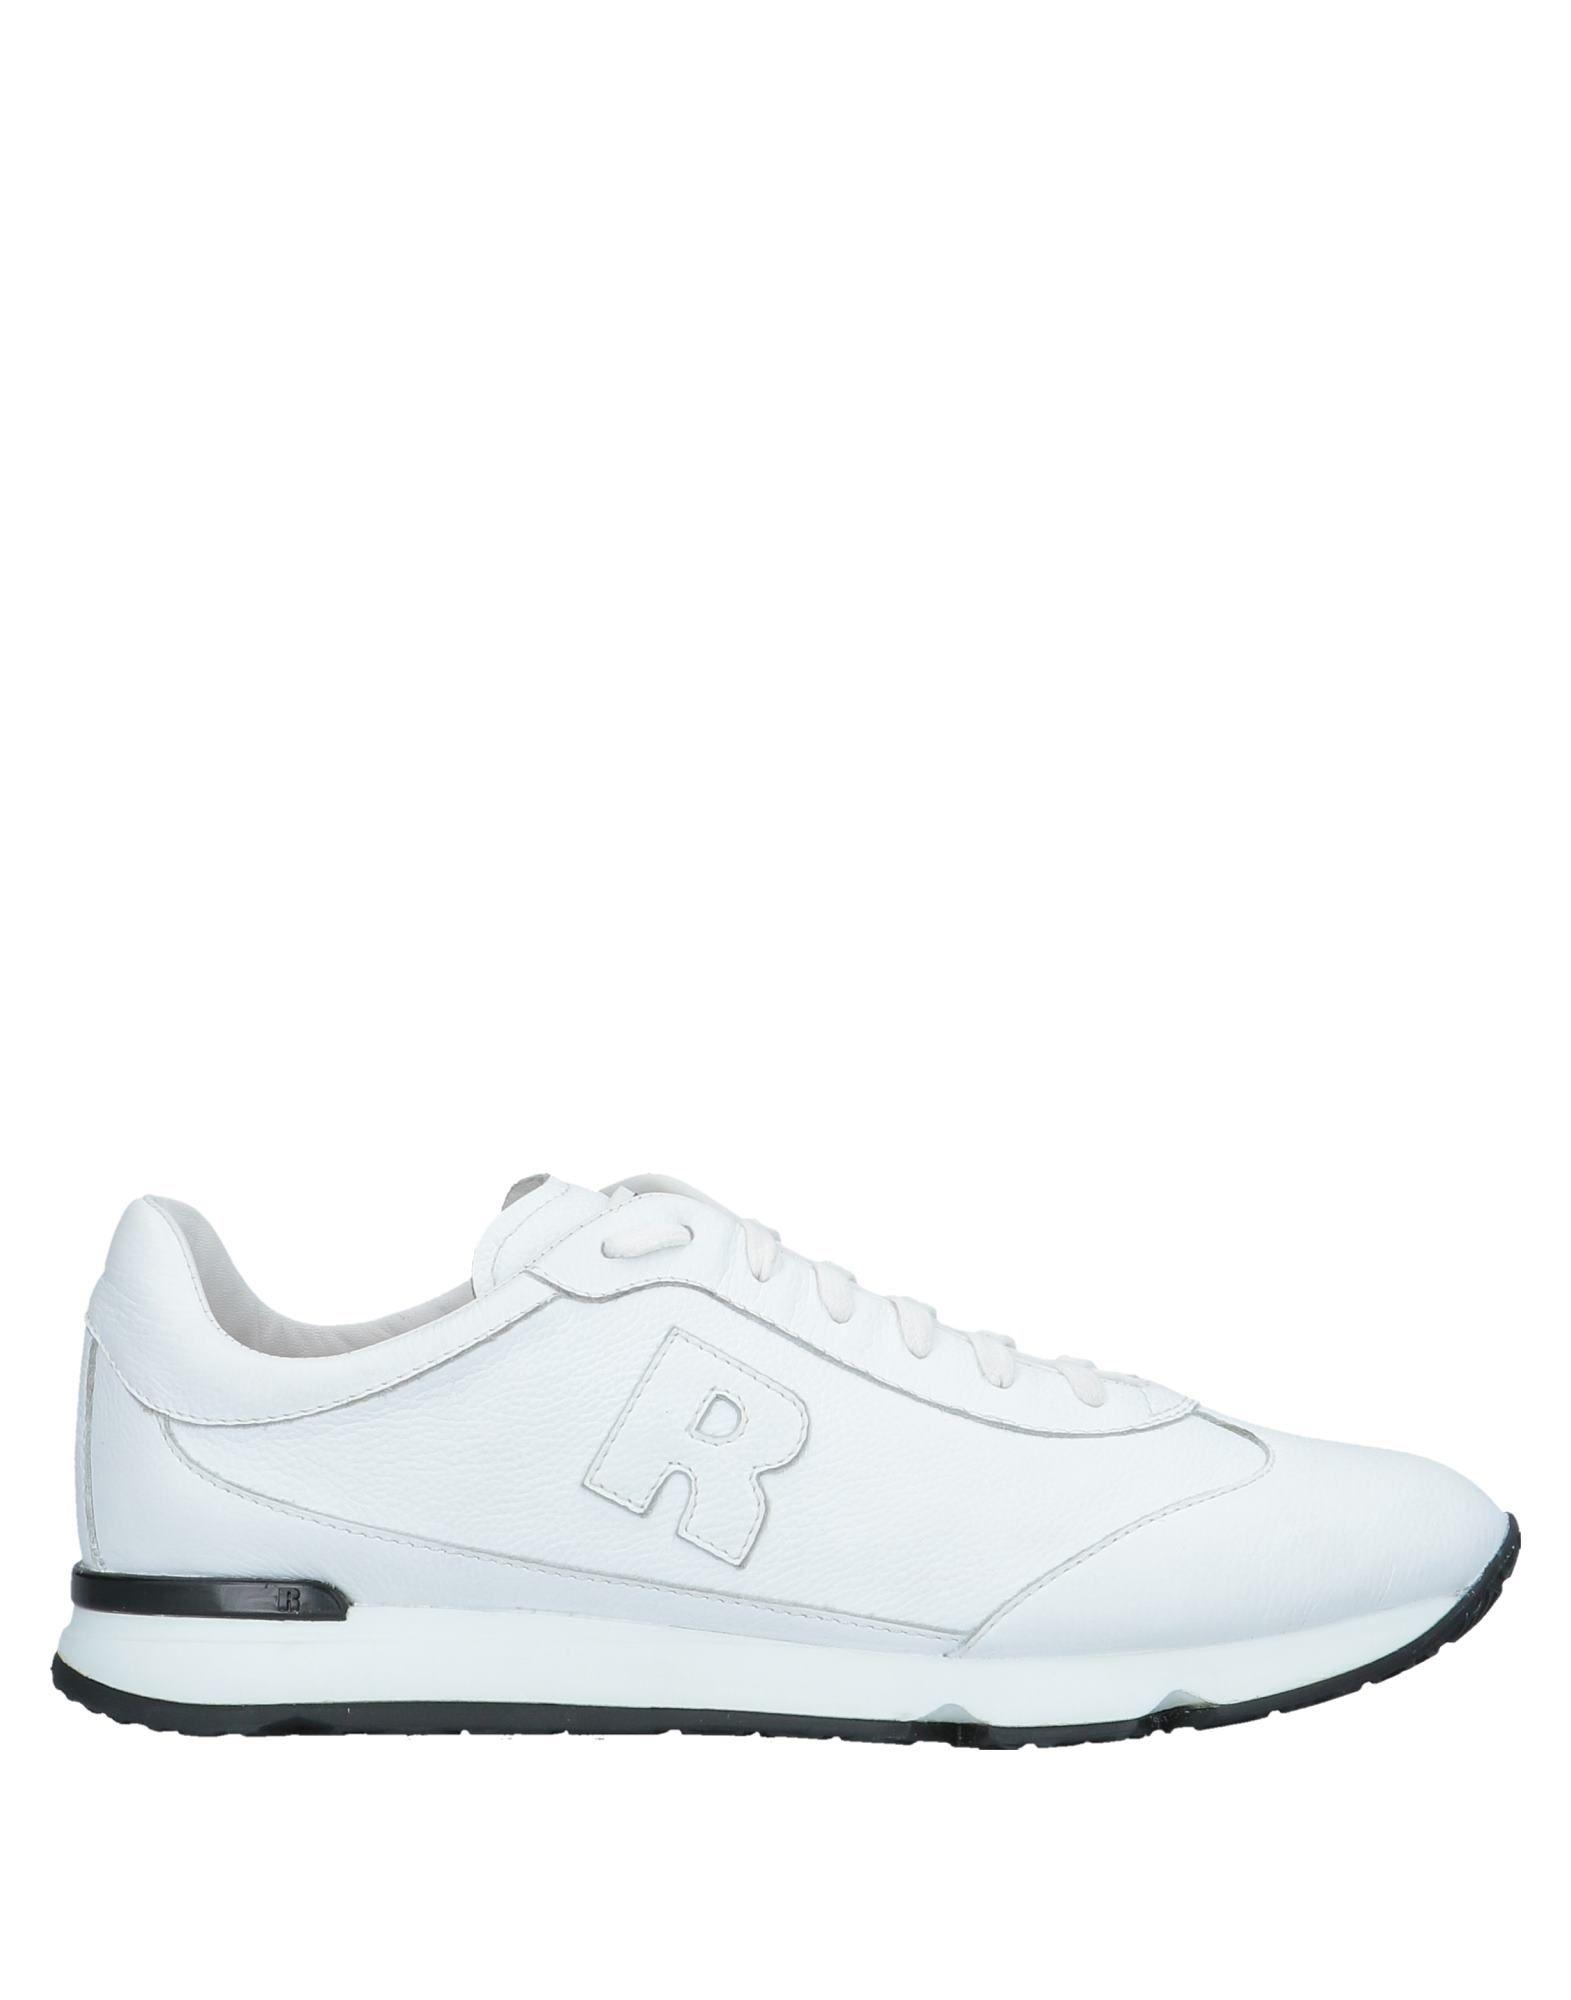 Ruco Line Sneakers Herren  Schuhe 11544419EW Gute Qualität beliebte Schuhe  ef2d2c